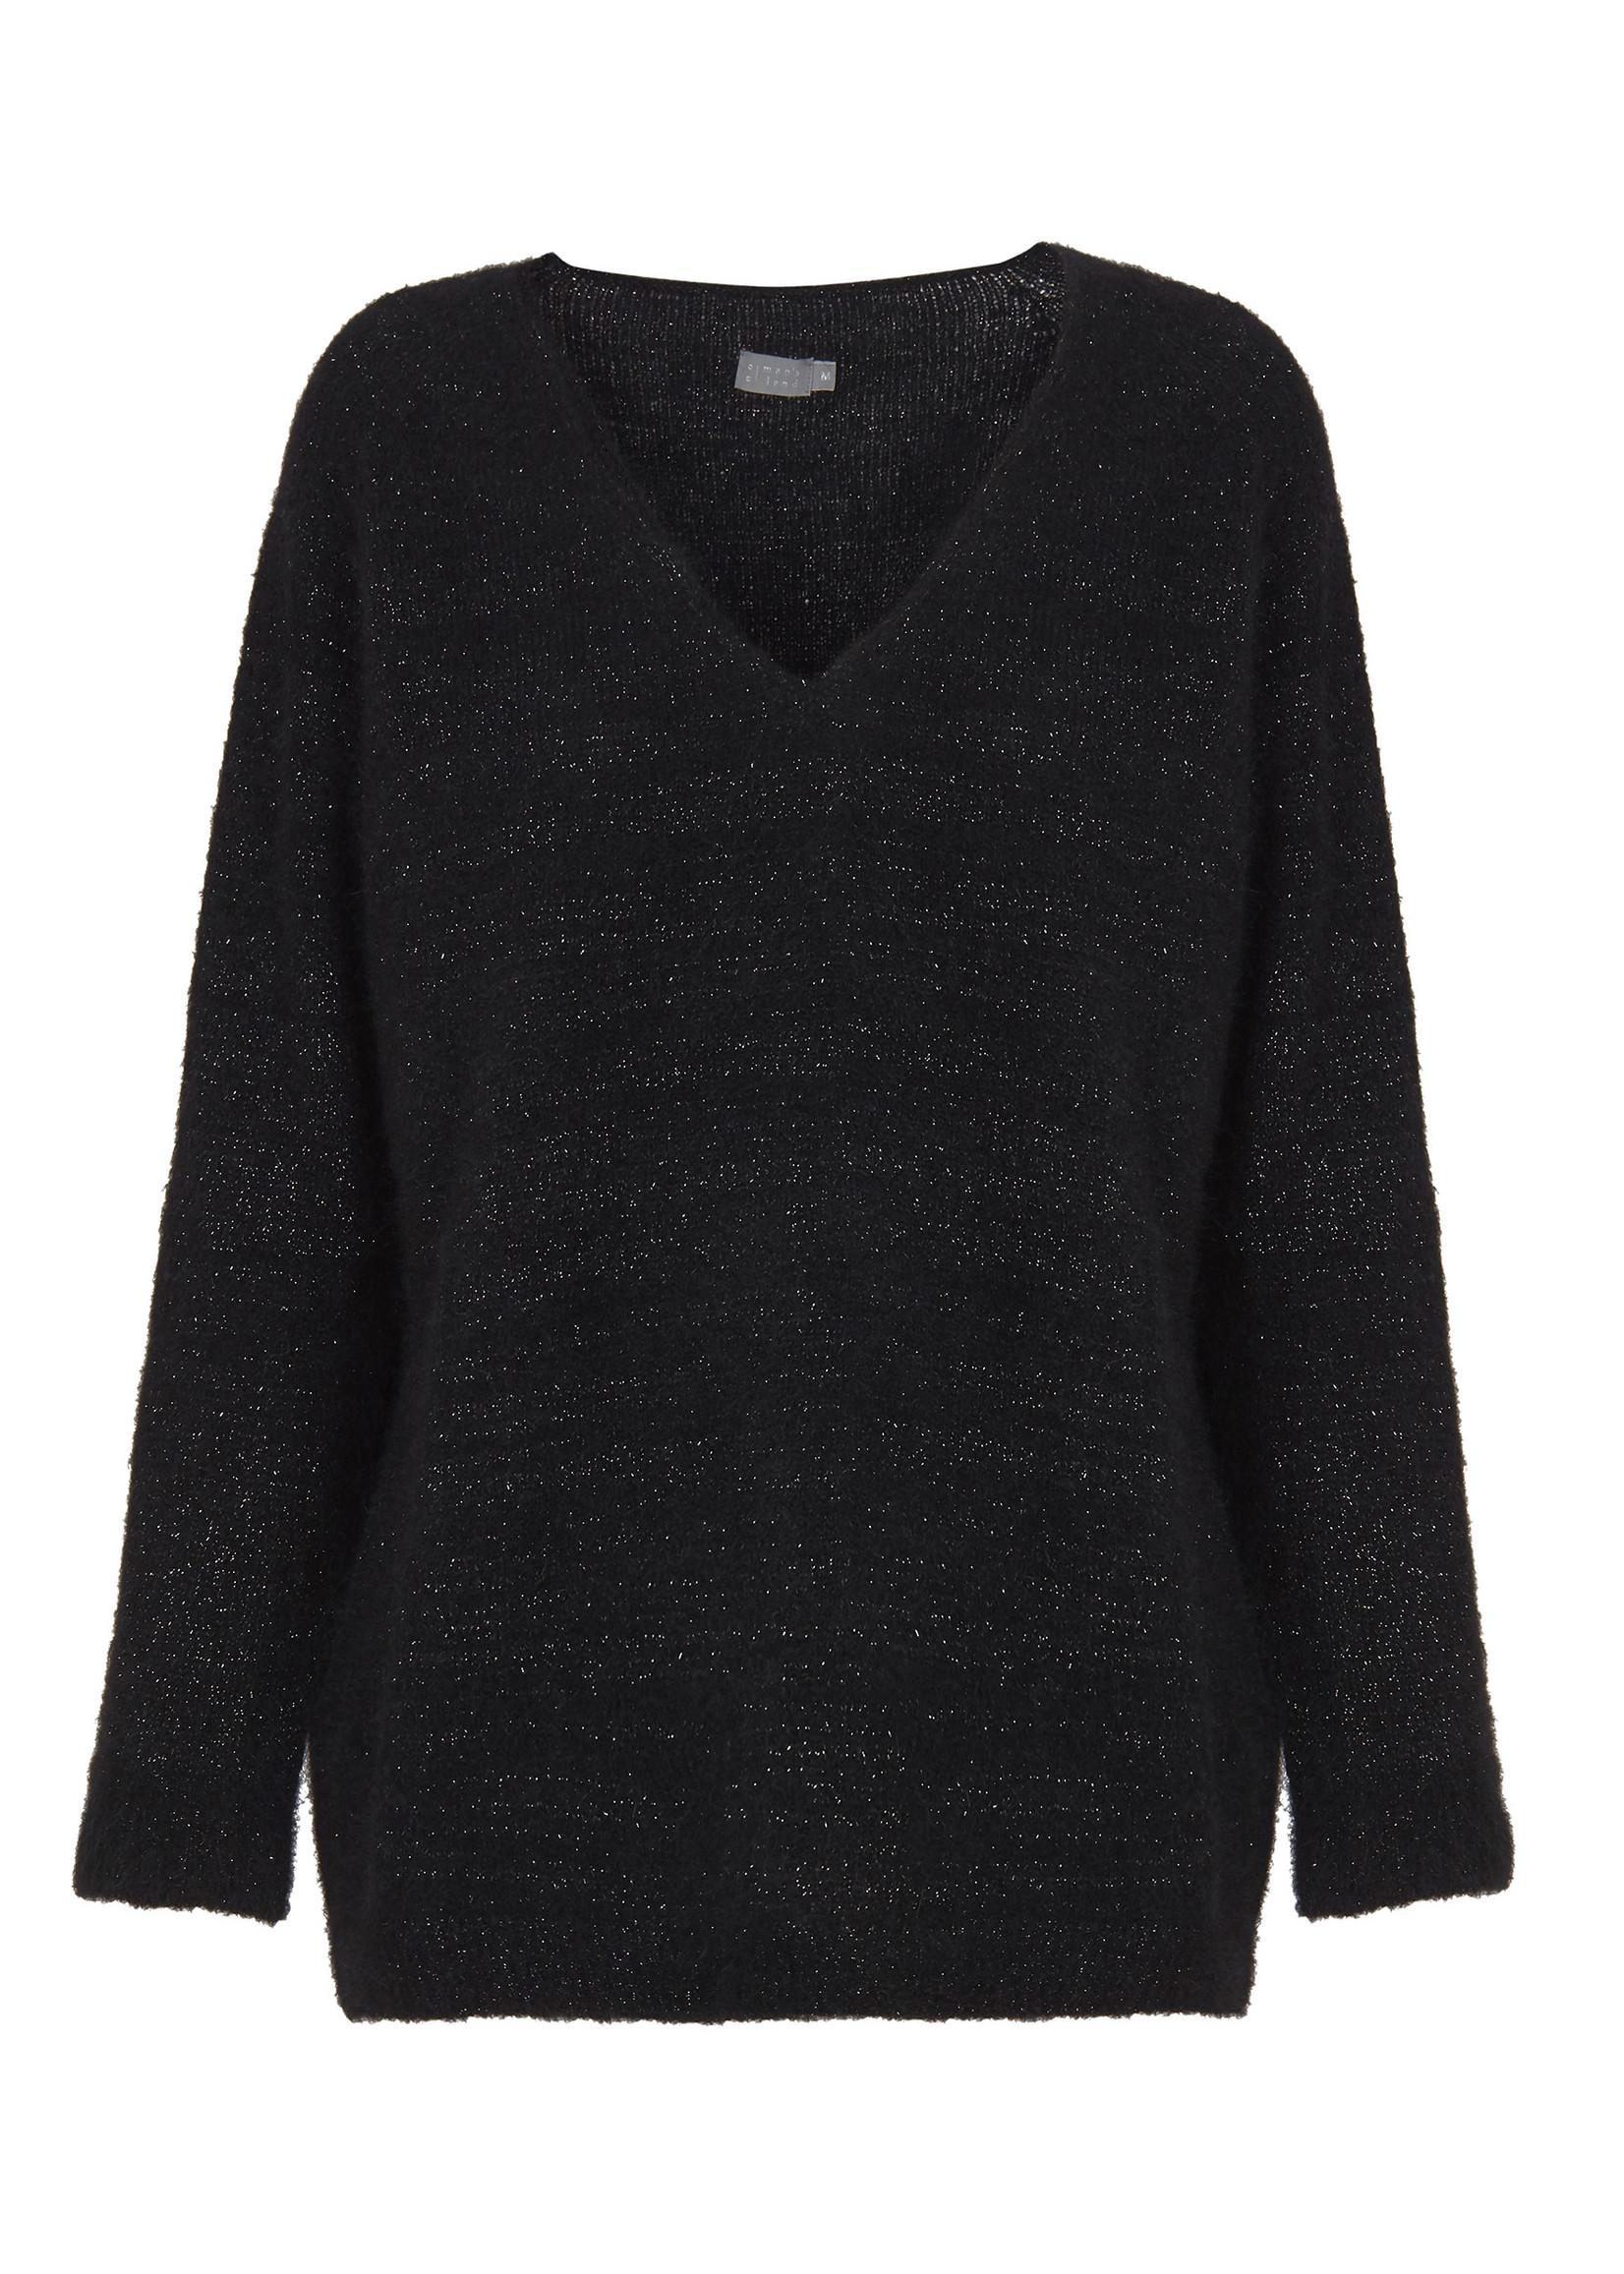 No Man's Land 56.164 Sweater